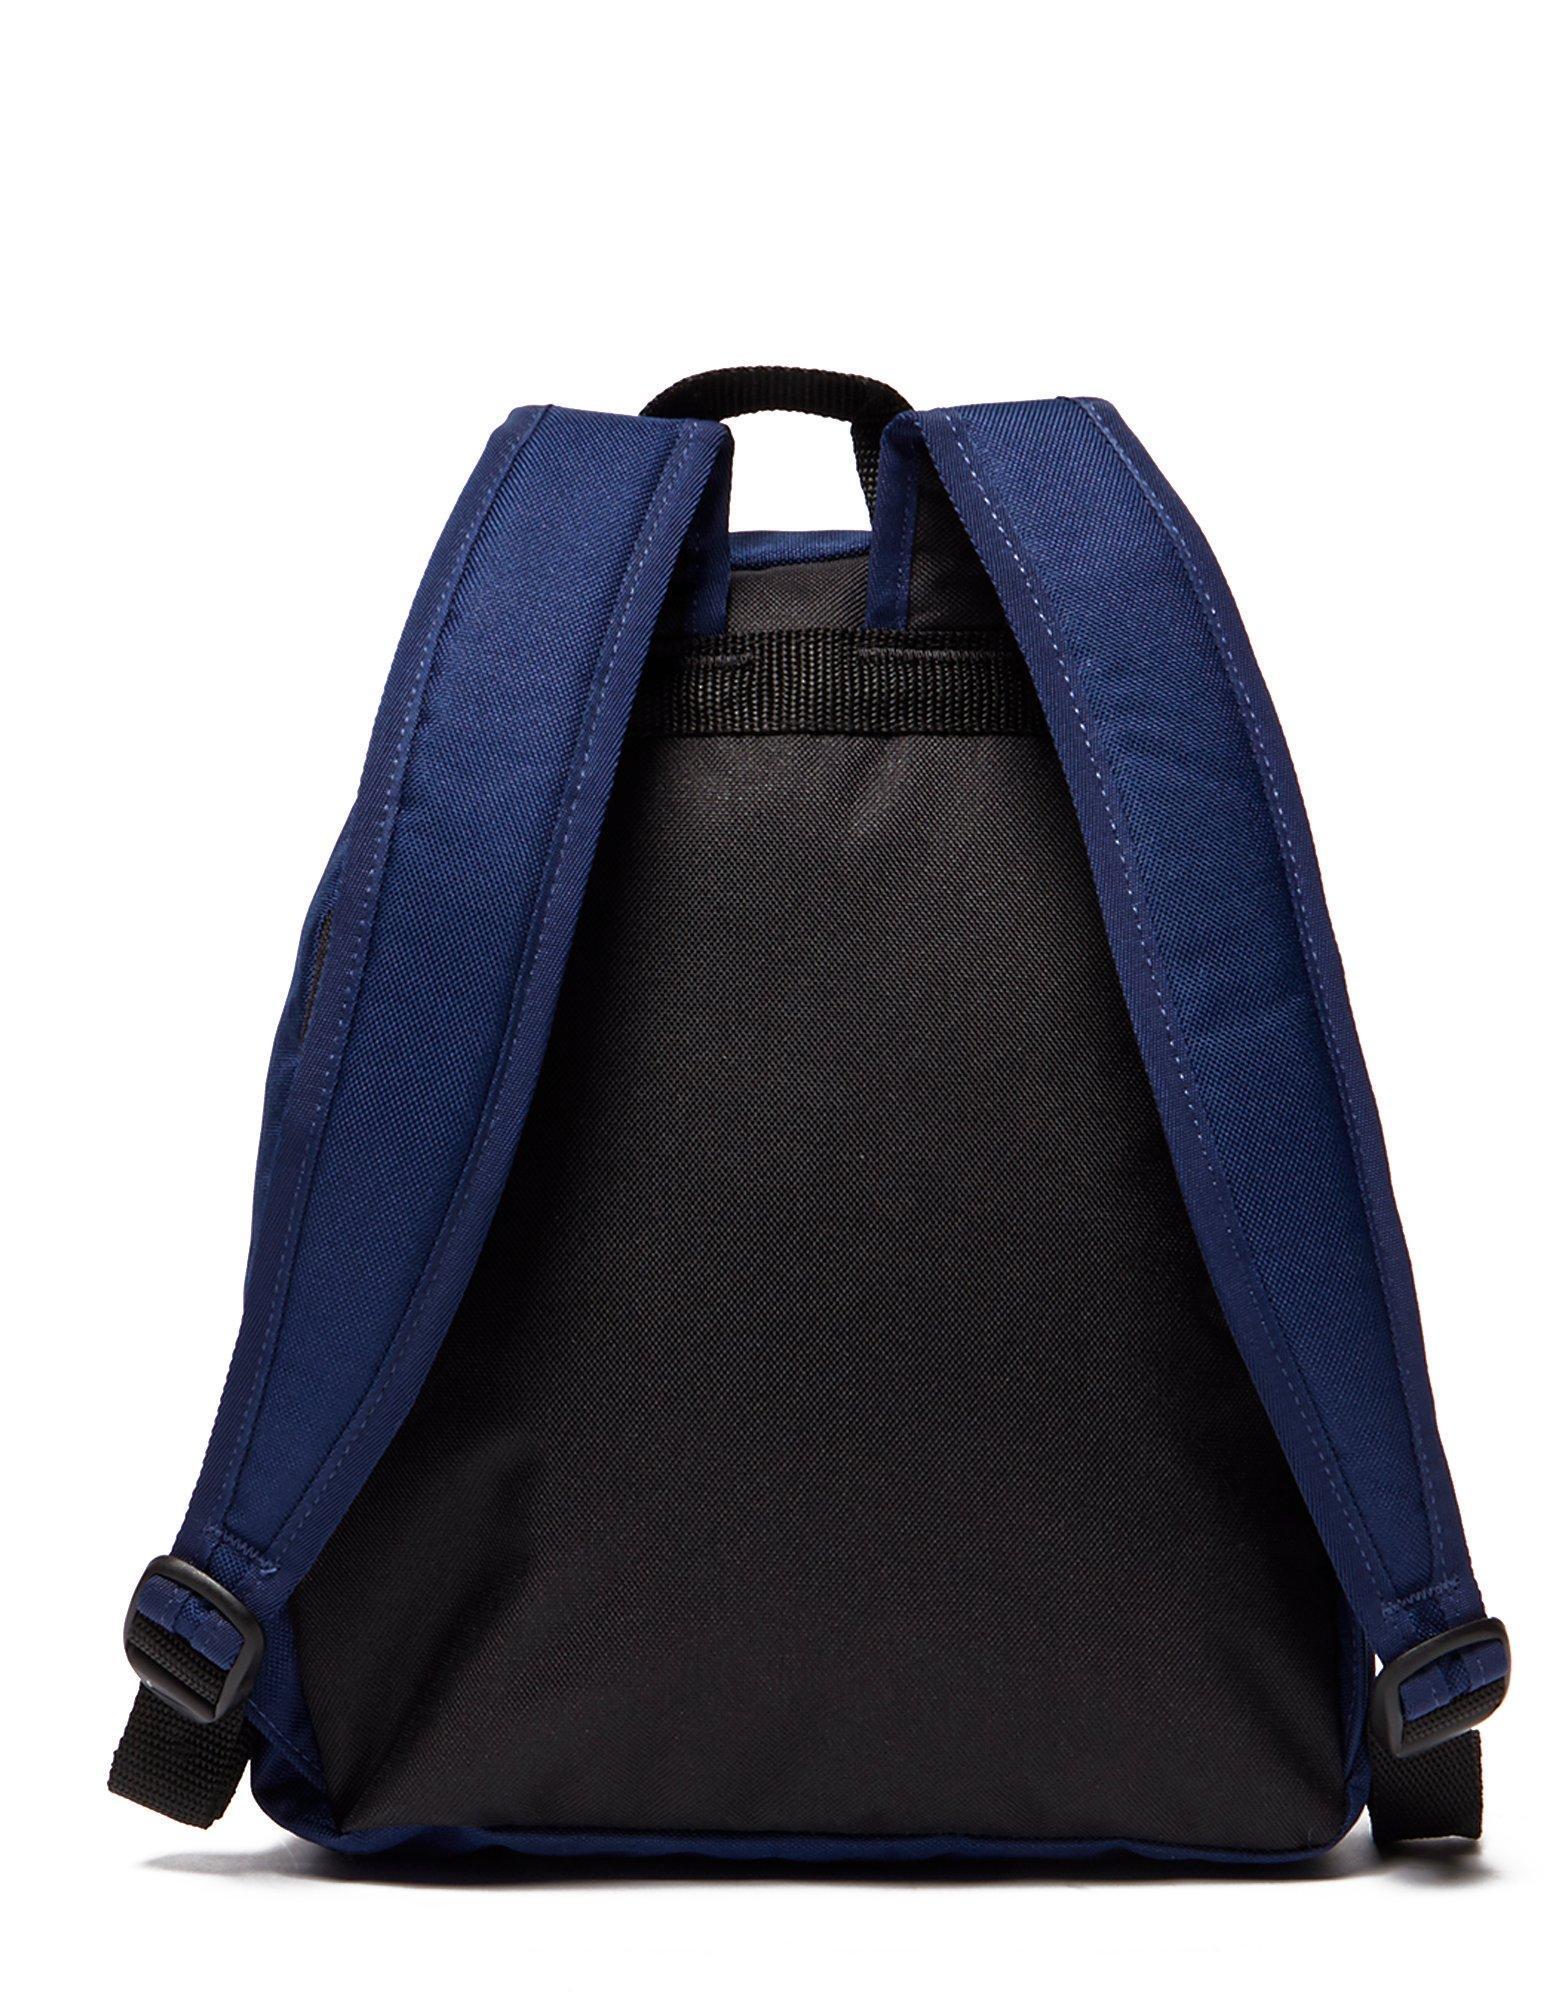 Carbrini Backpack Black and Pink